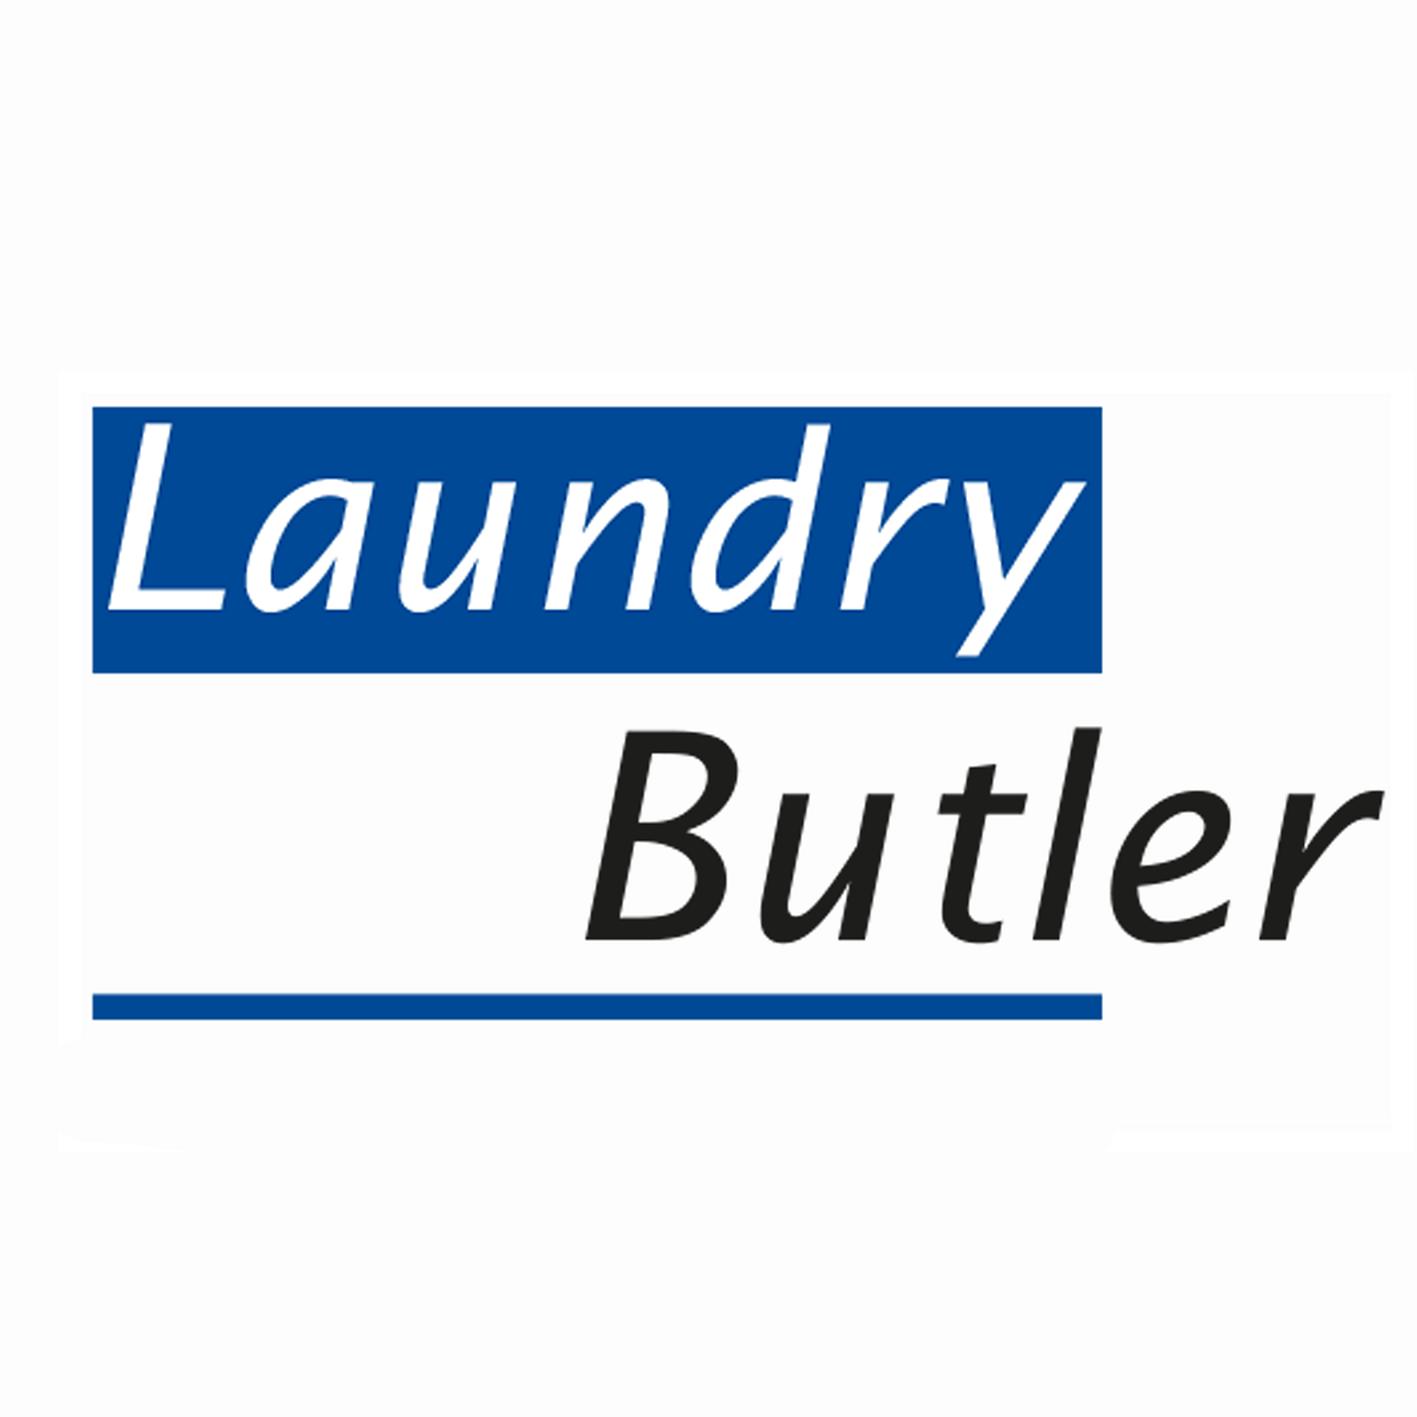 Laundry Butler & Store Yoken GmbH